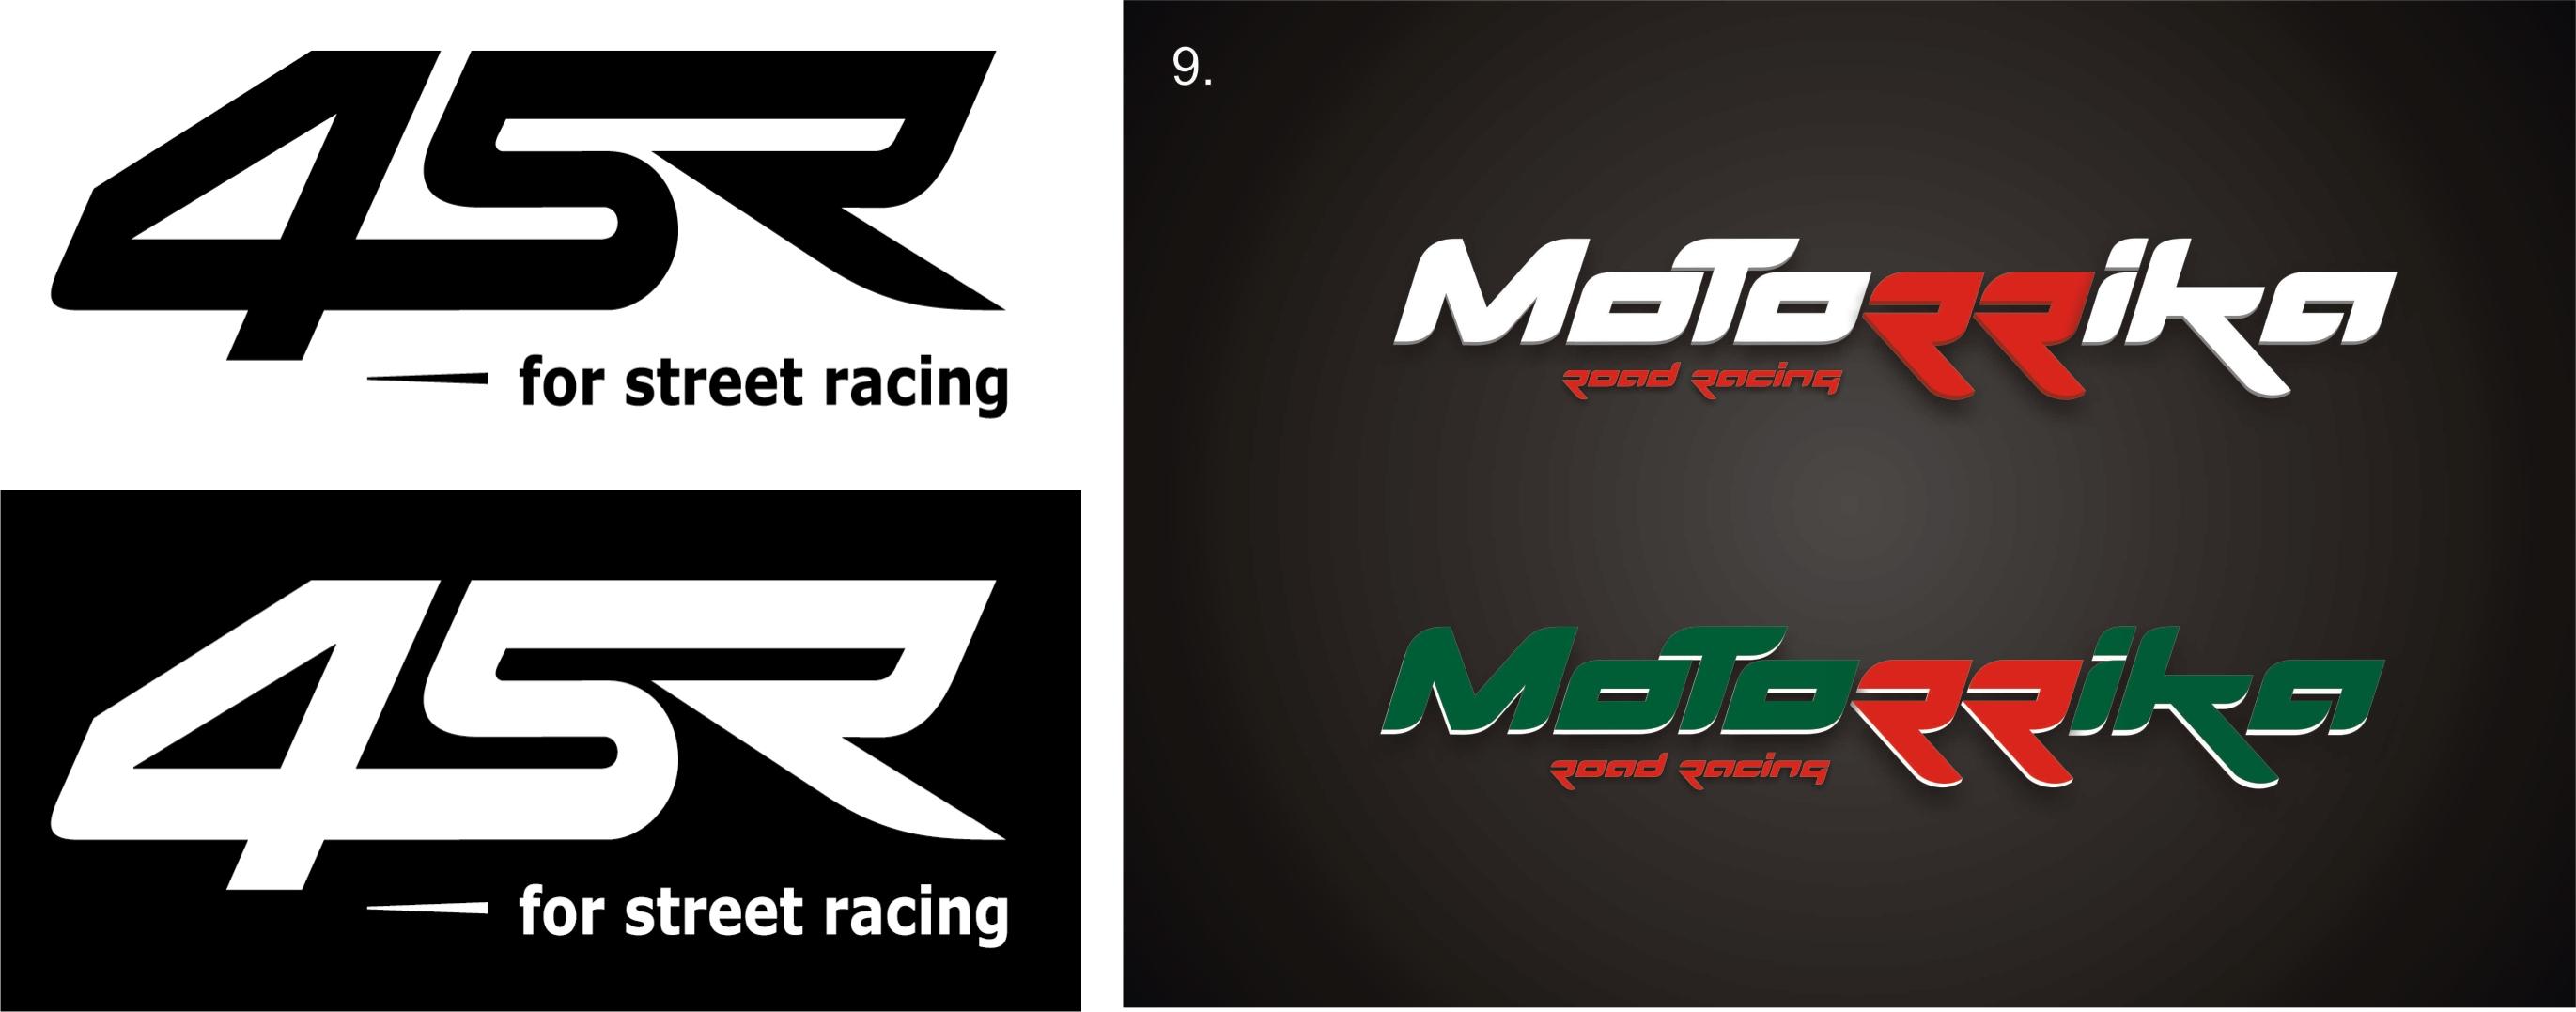 Мотогонки. Логотип, фирменный стиль. фото f_4dd2d23446d16.jpg